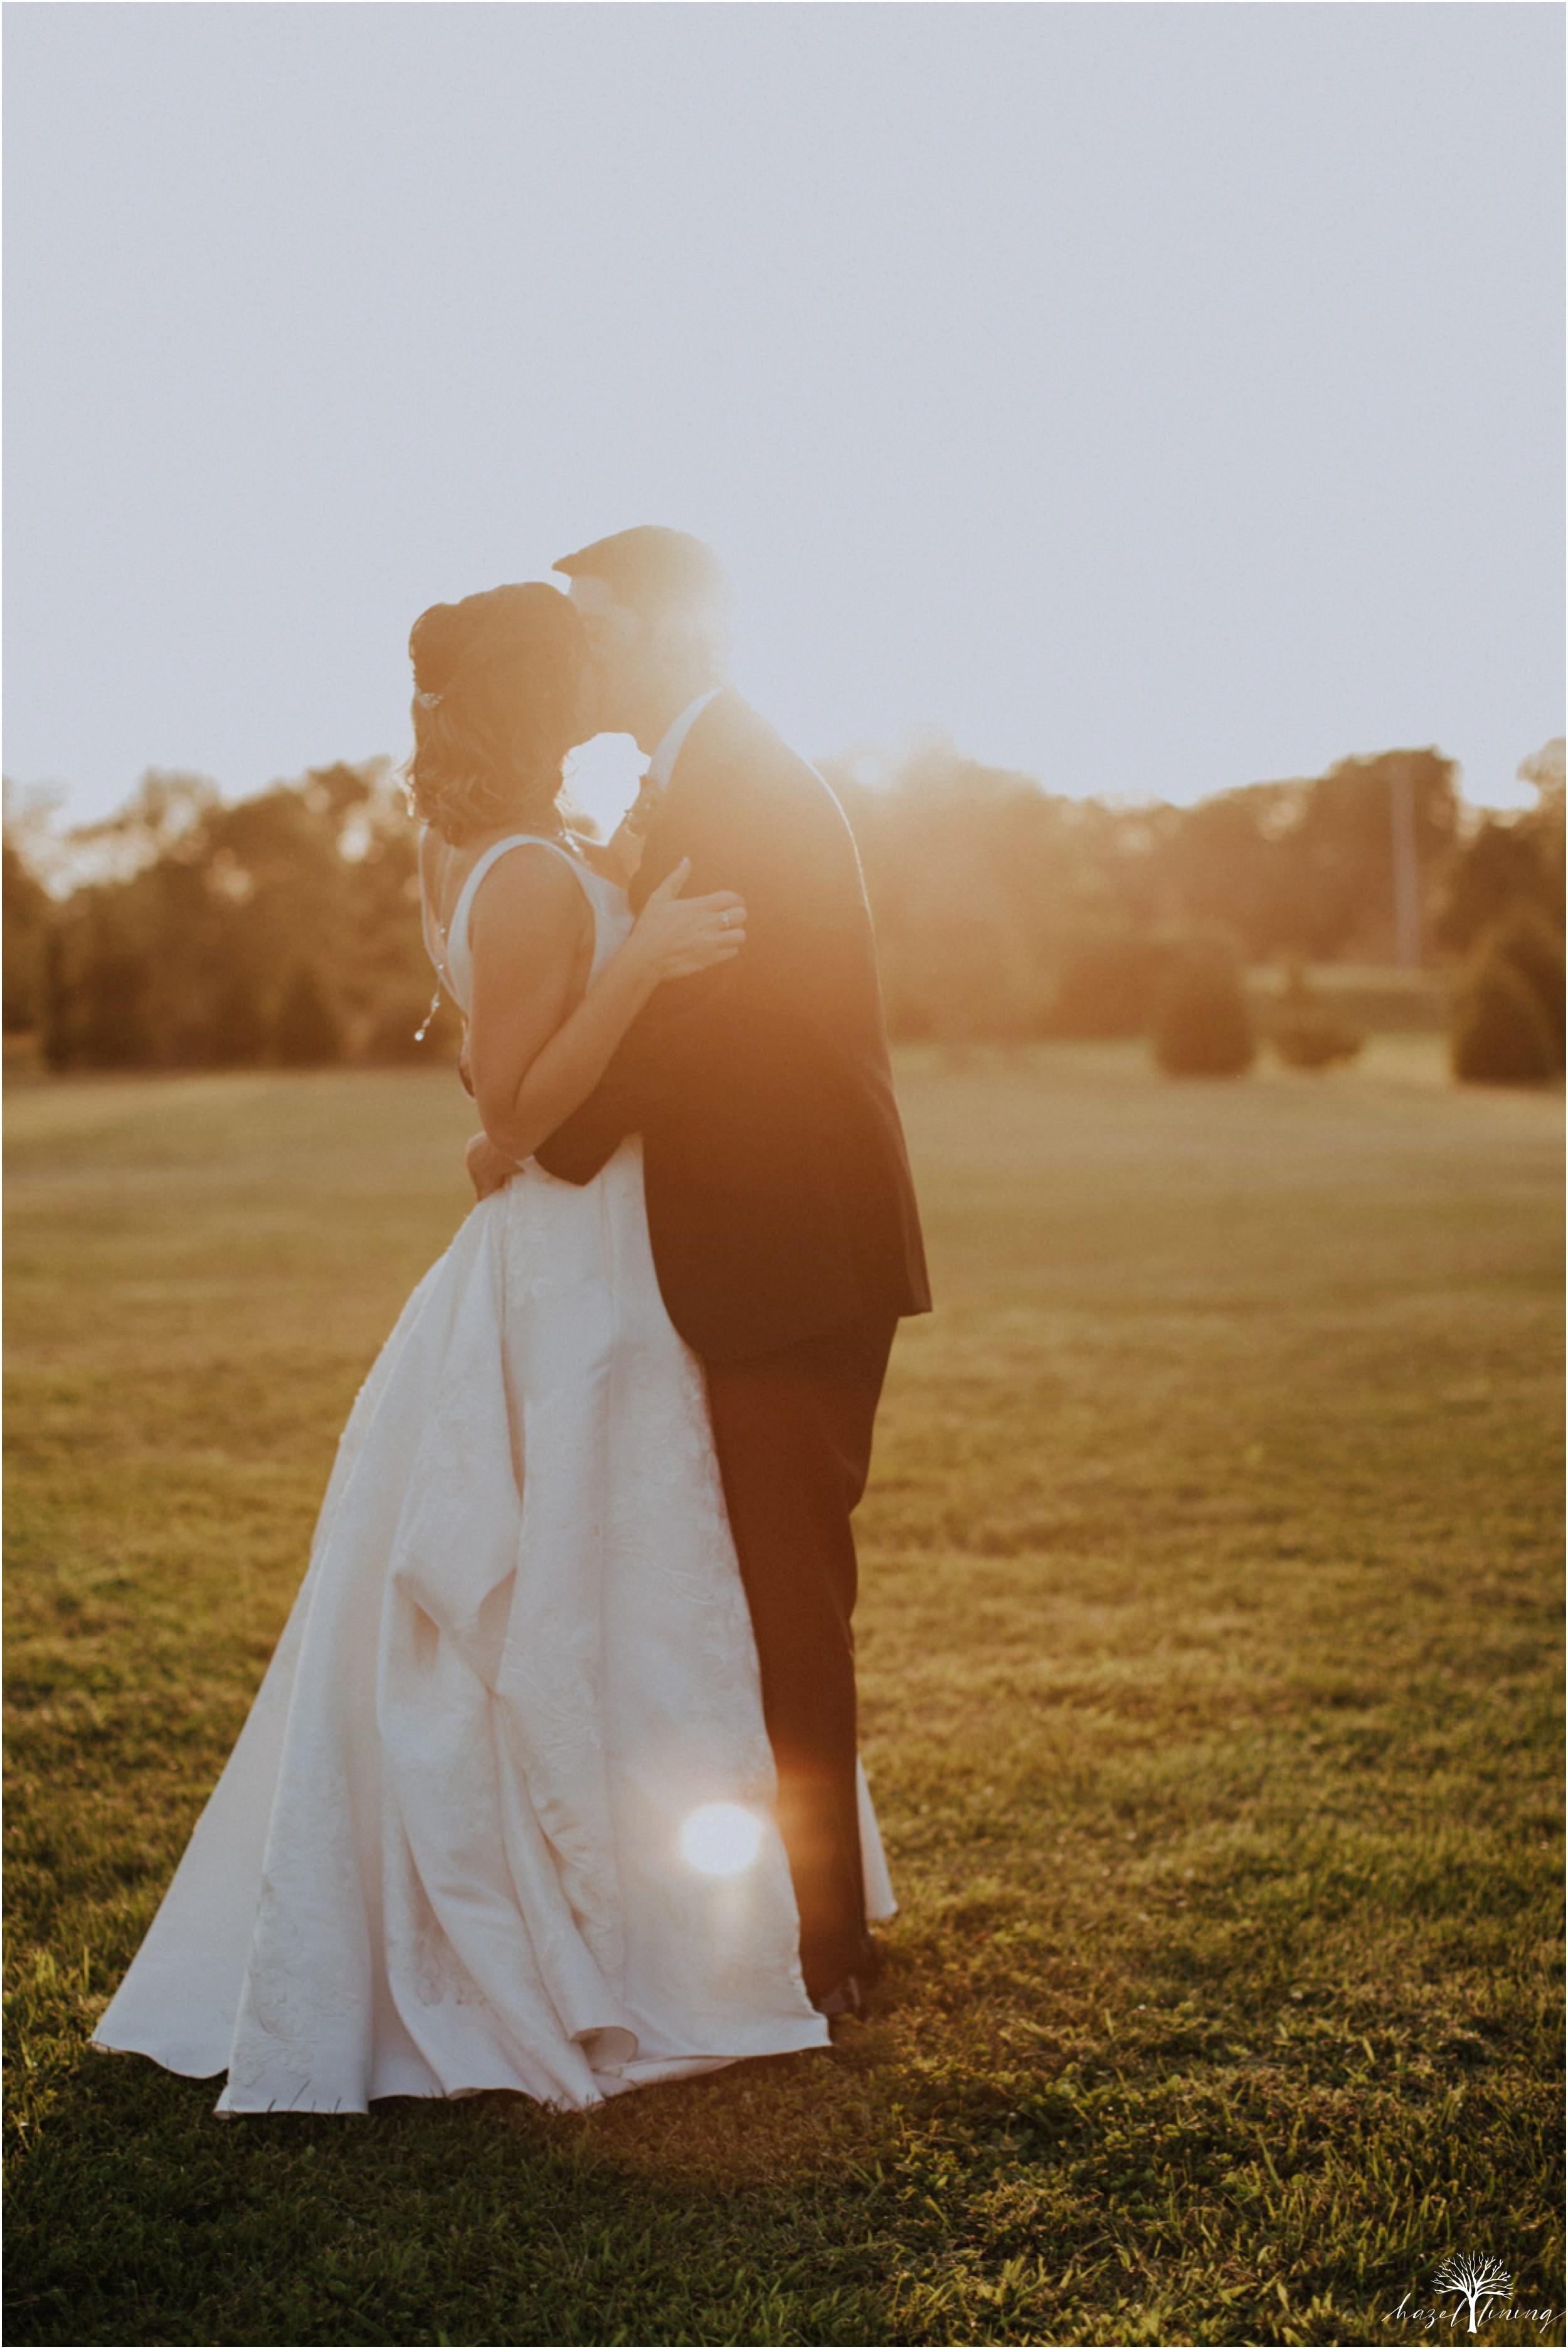 maureen-hepner-anthony-giordano-rose-bank-winery-newtow-pennsylvania-luxury-summer-wedding-hazel-lining-photography-destination-elopement-wedding-engagement-photography_0170.jpg